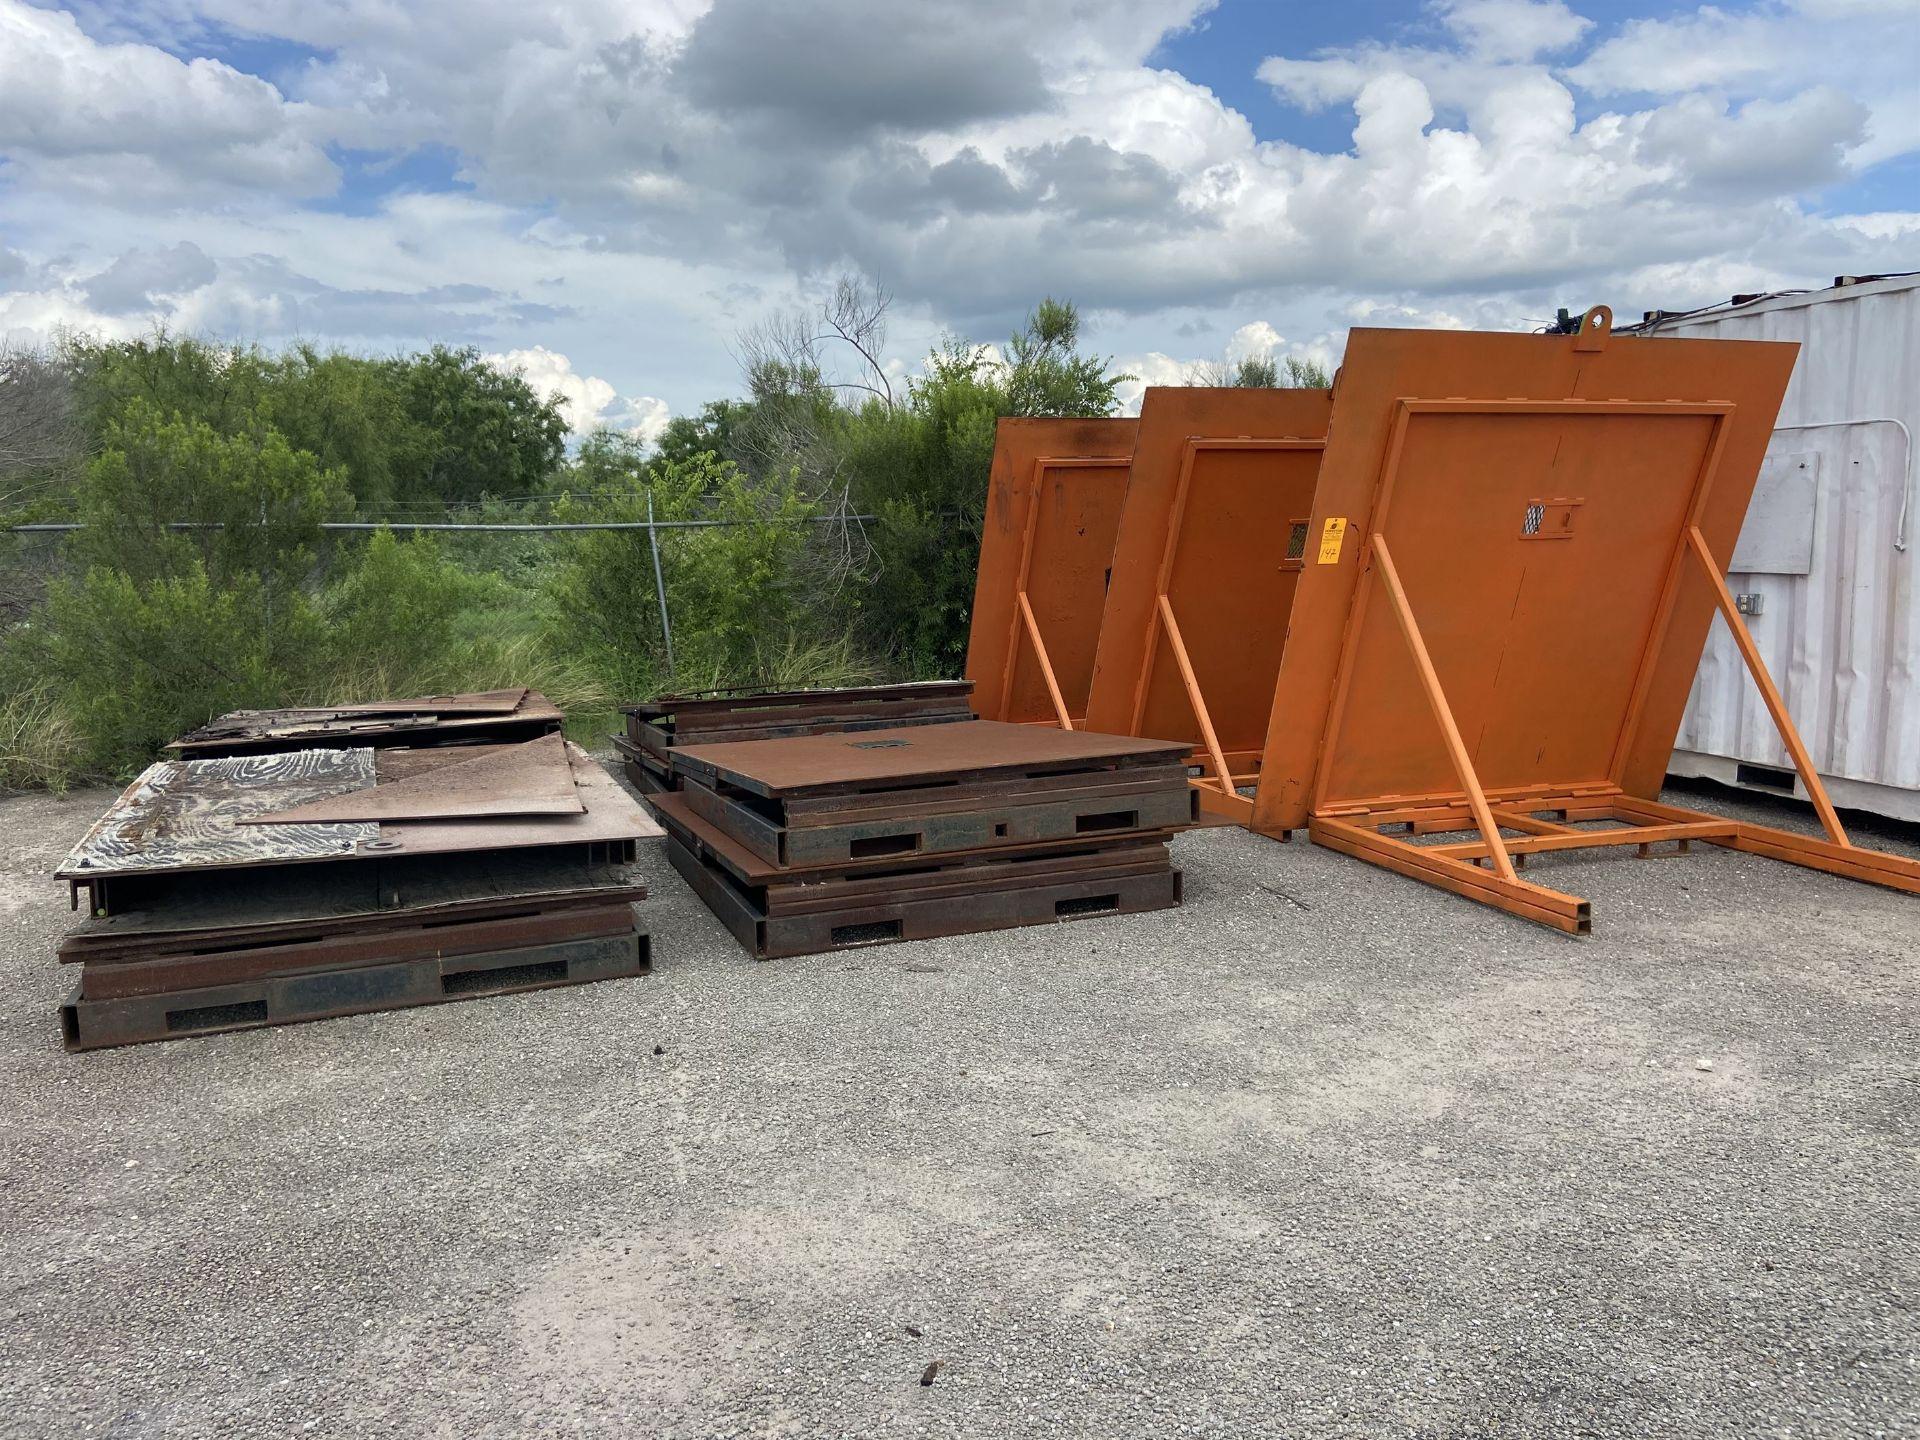 Lot of Portable Blast Shields